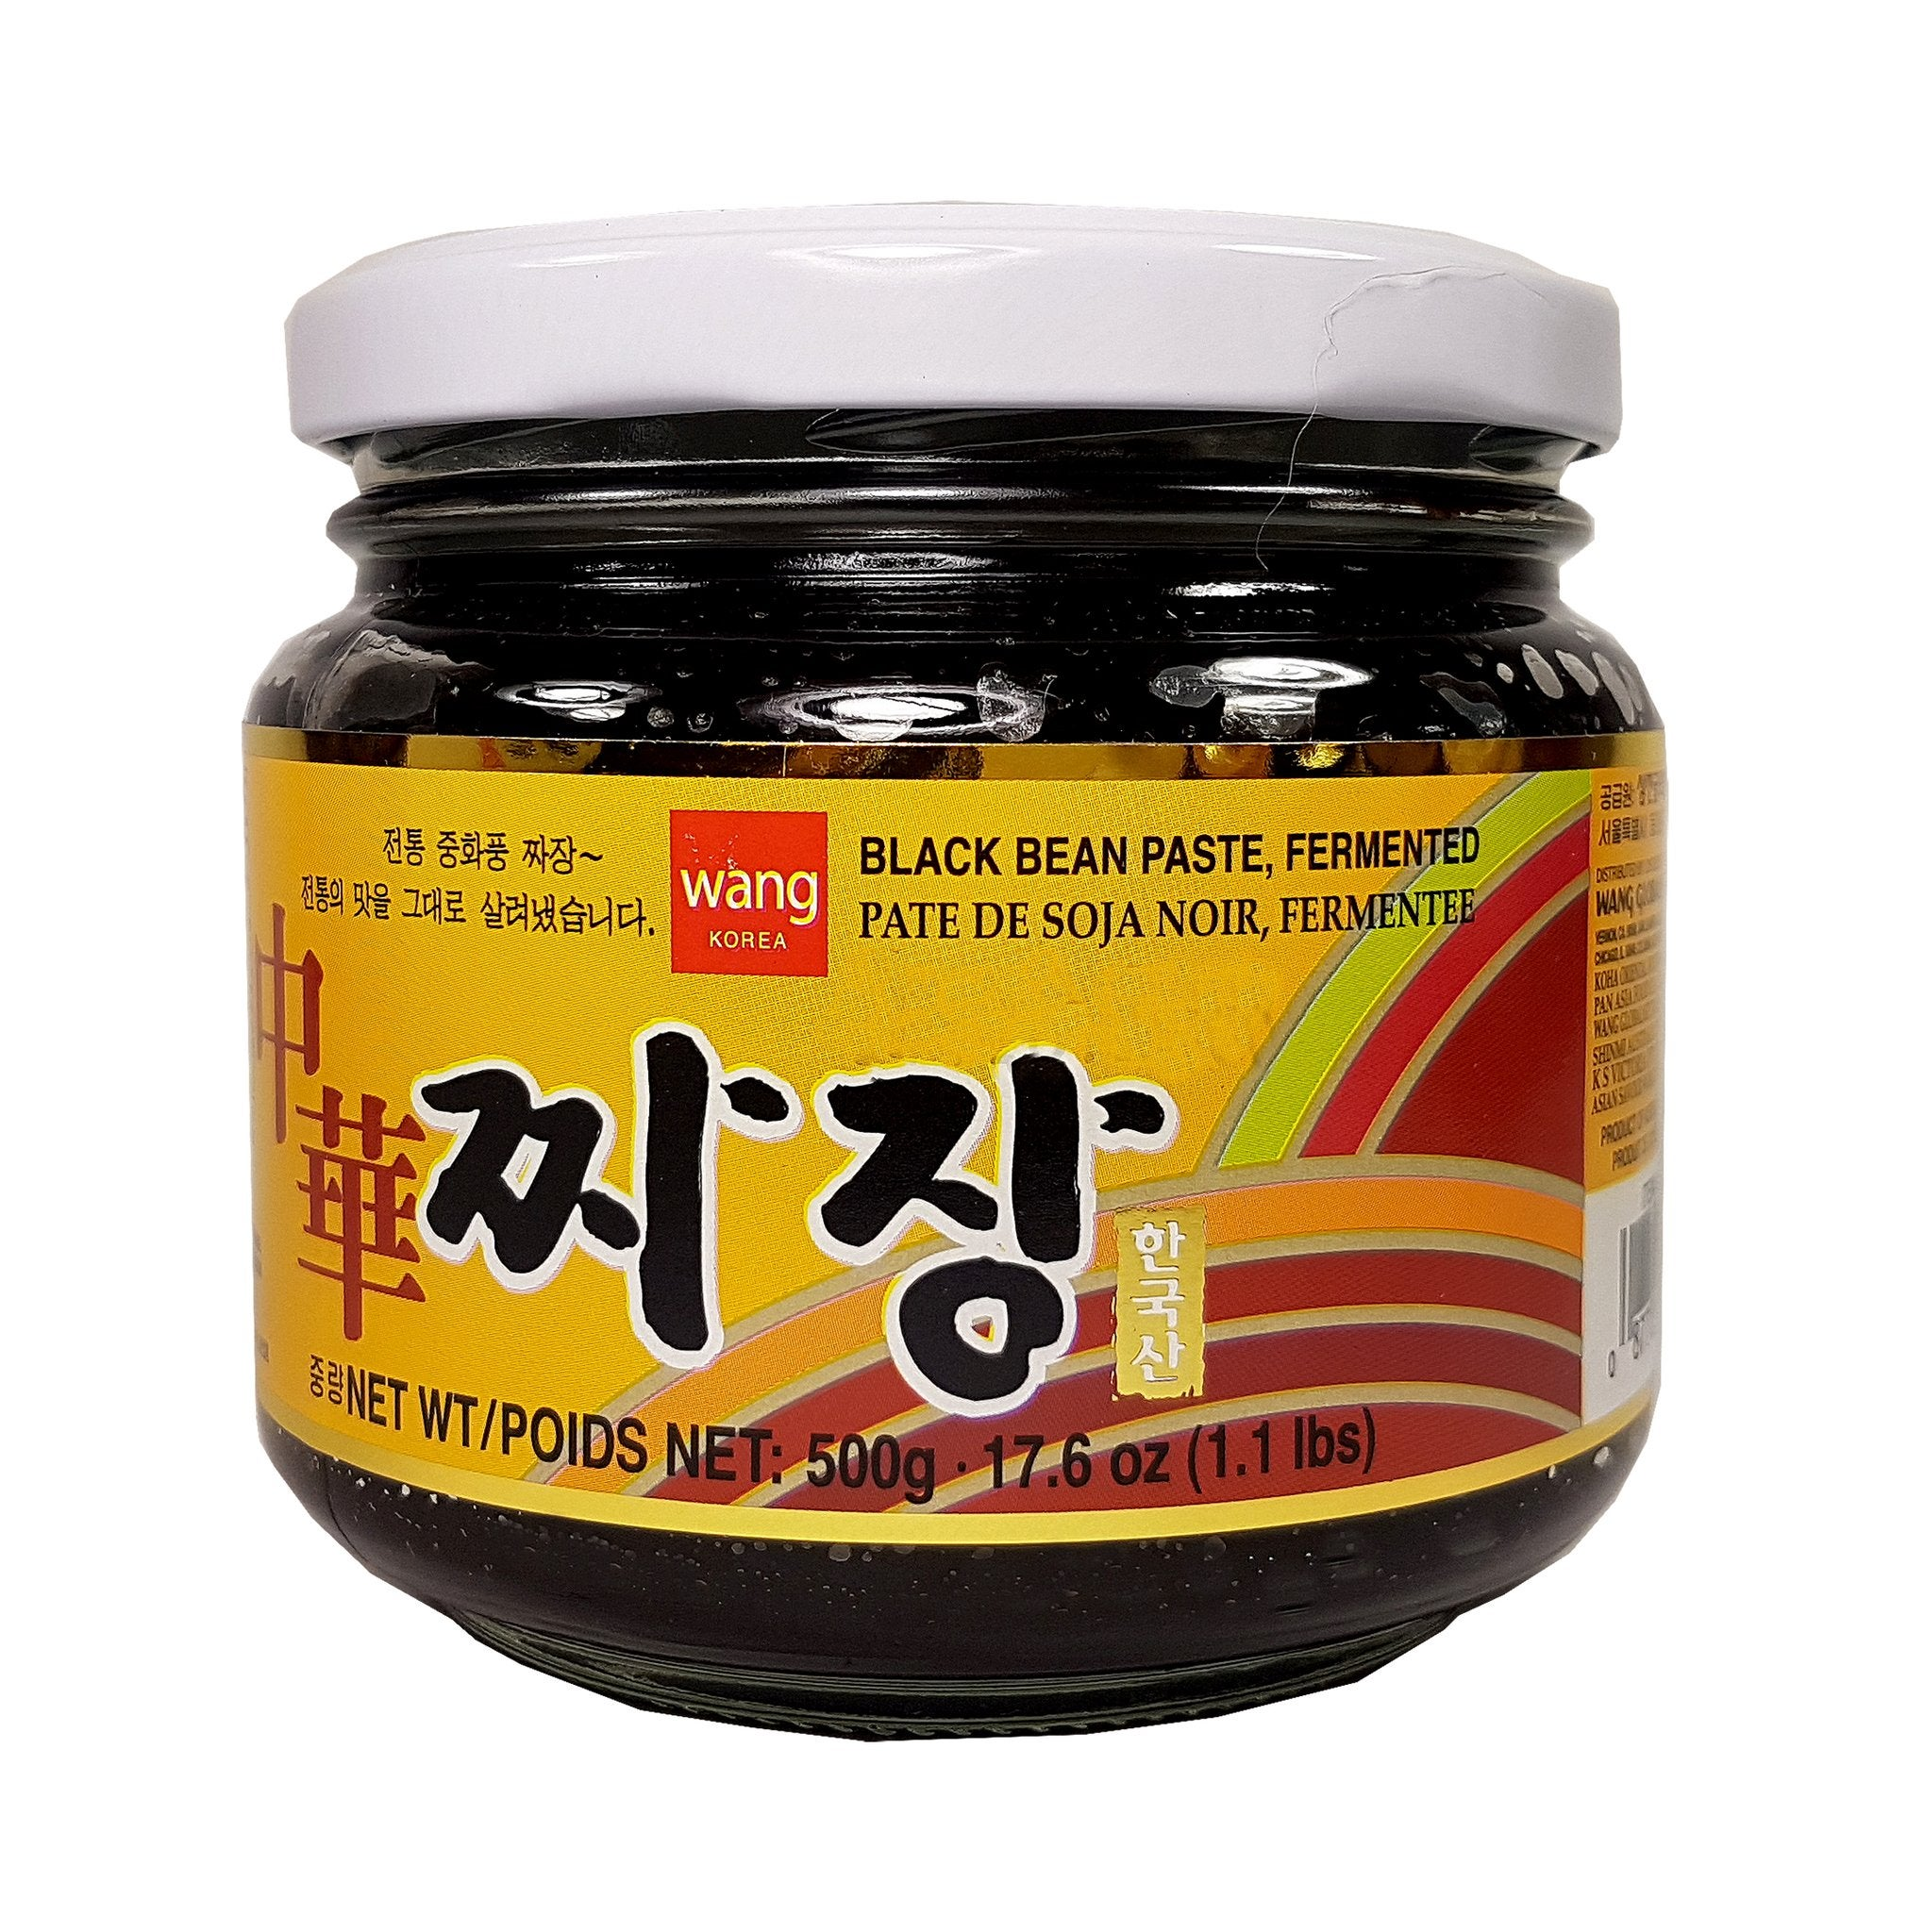 Fermented black bean paste